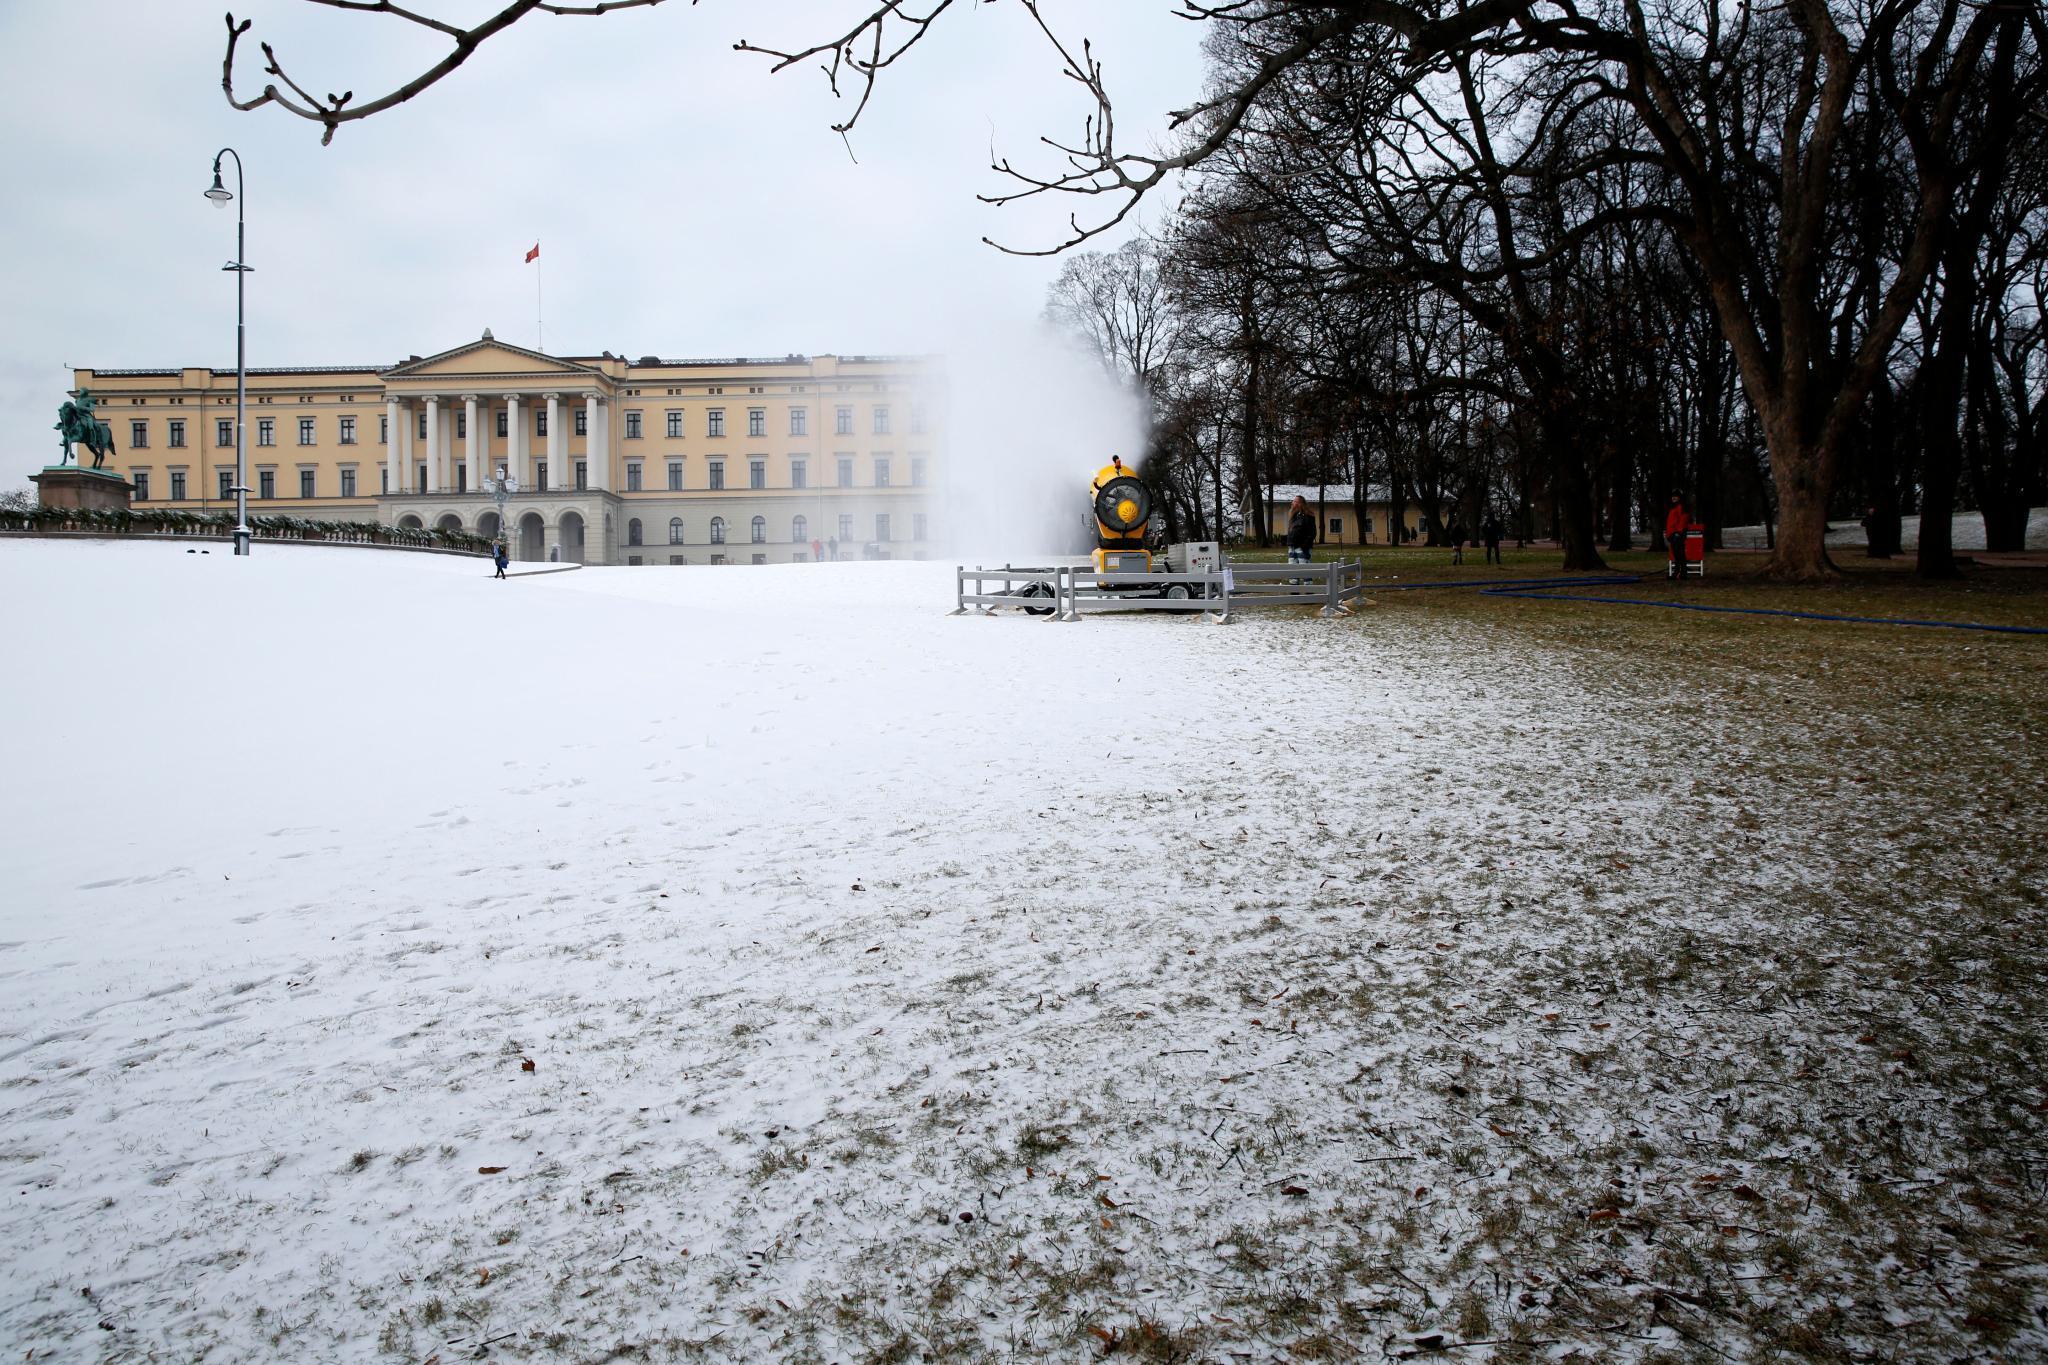 Stadtschloss Oslo samt Schneekanone